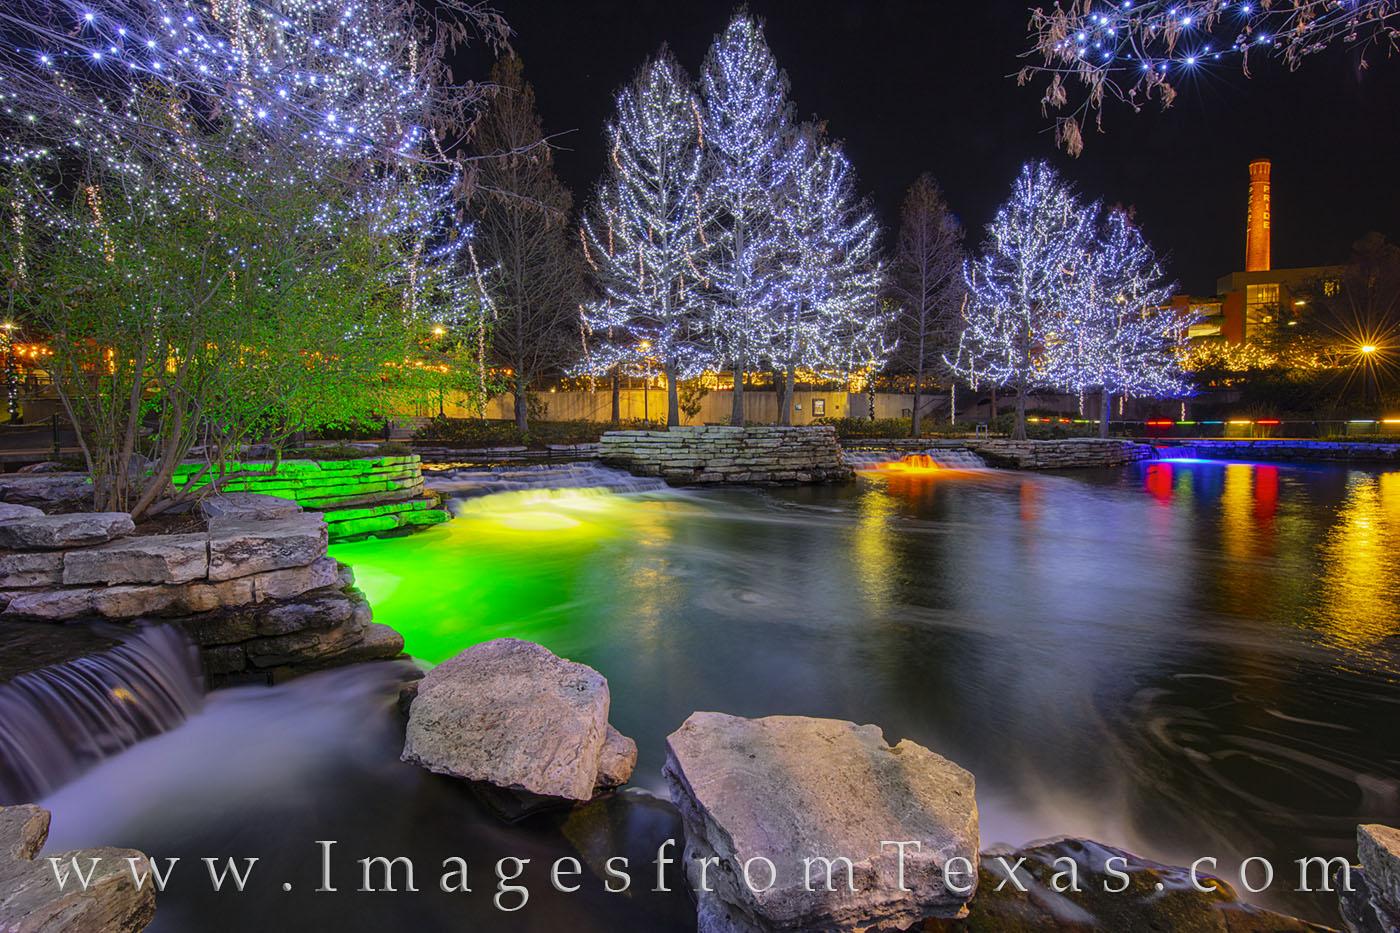 Pearl District, holiday lights, christmas, lights, holiday, san antonio river, rio taxi, december, san antonio, photo